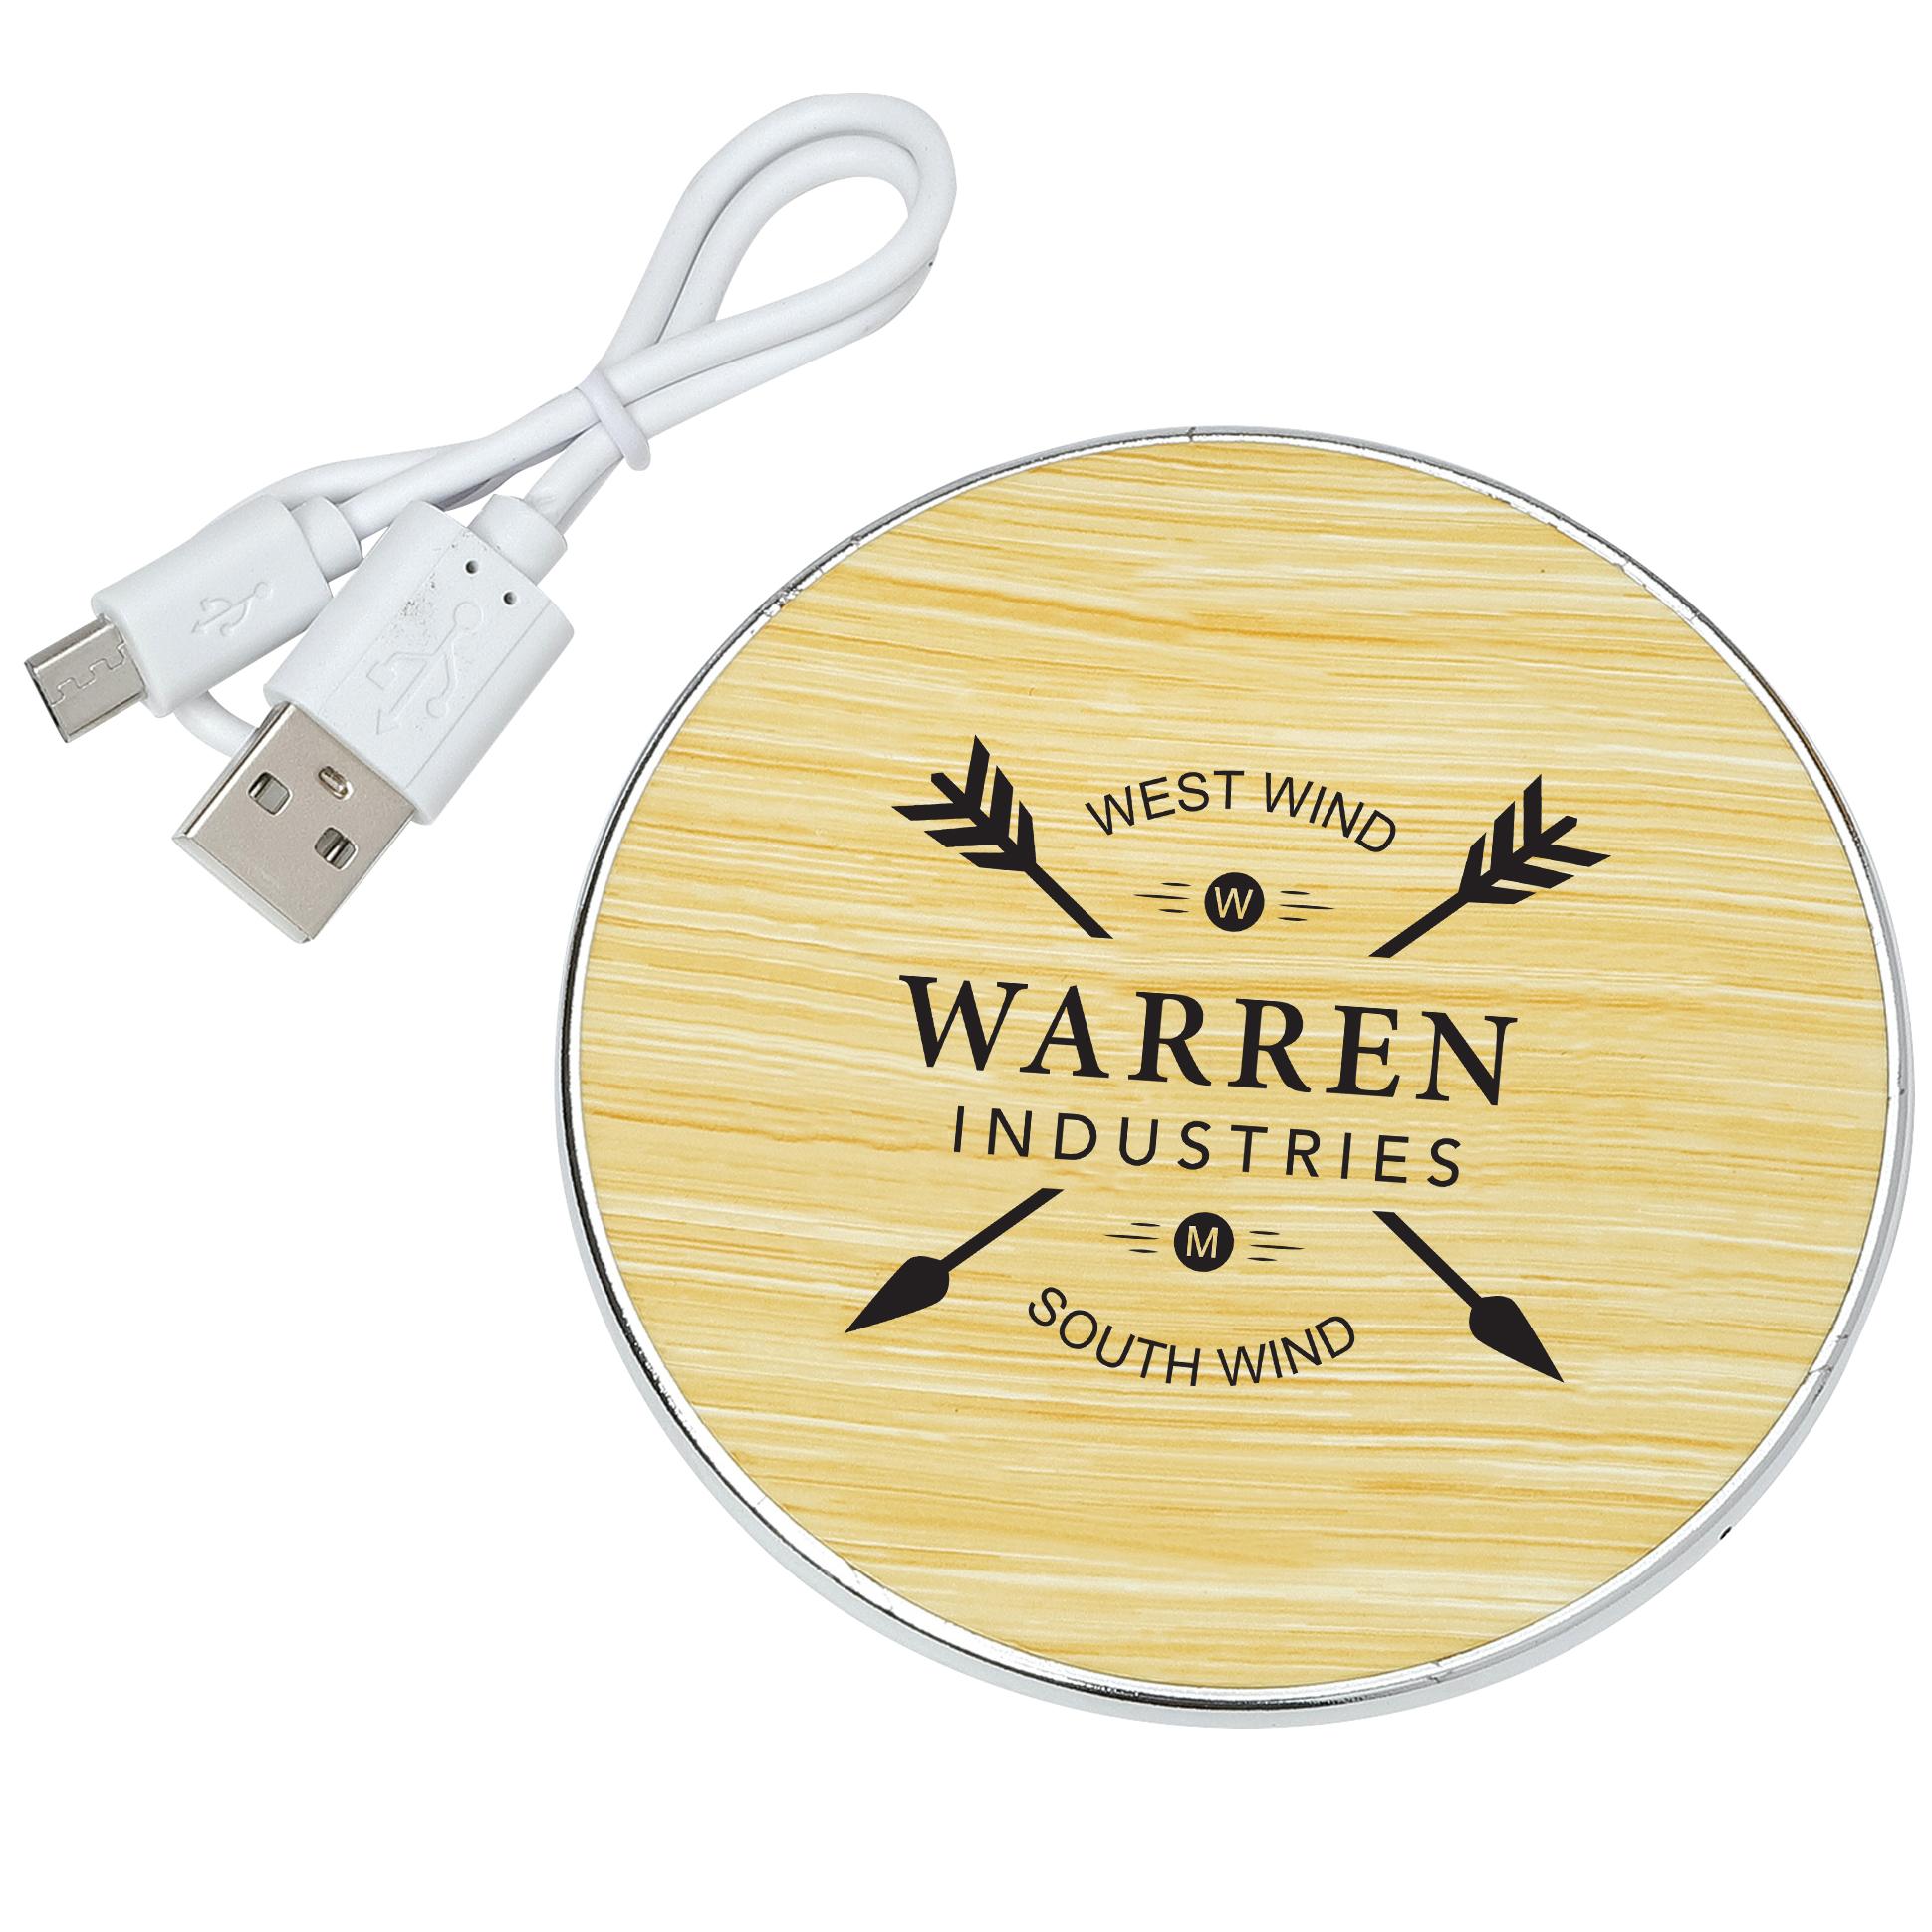 Rustic Wireless Charging Pad